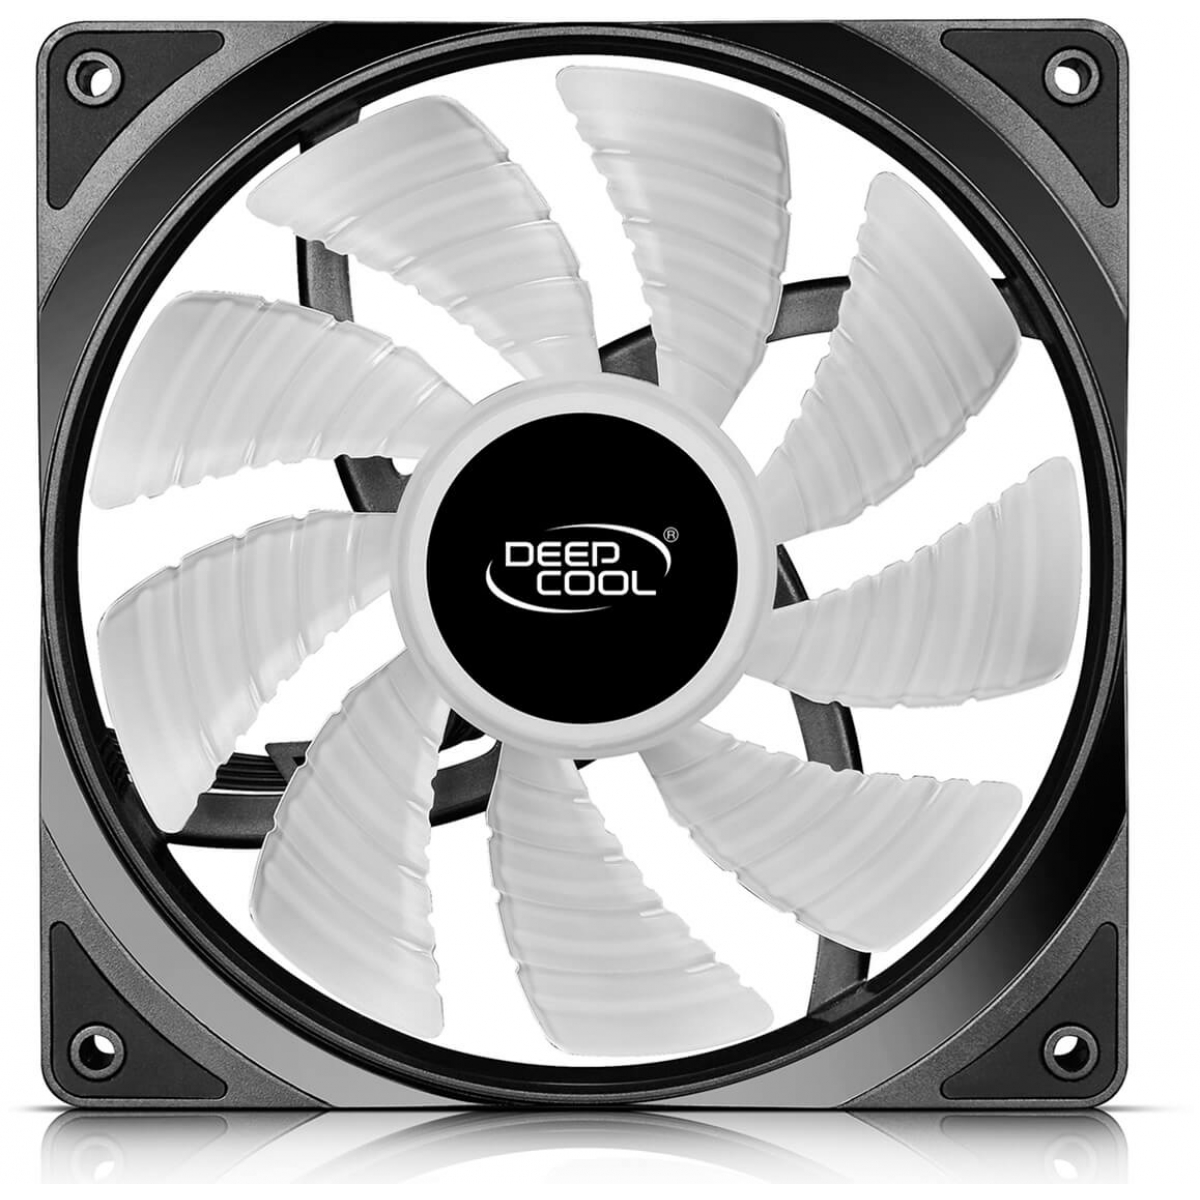 Kit Fan com 2 Unidades Deepcool RF 140 RGB 140mm, DP-FRGB-RF140-2C